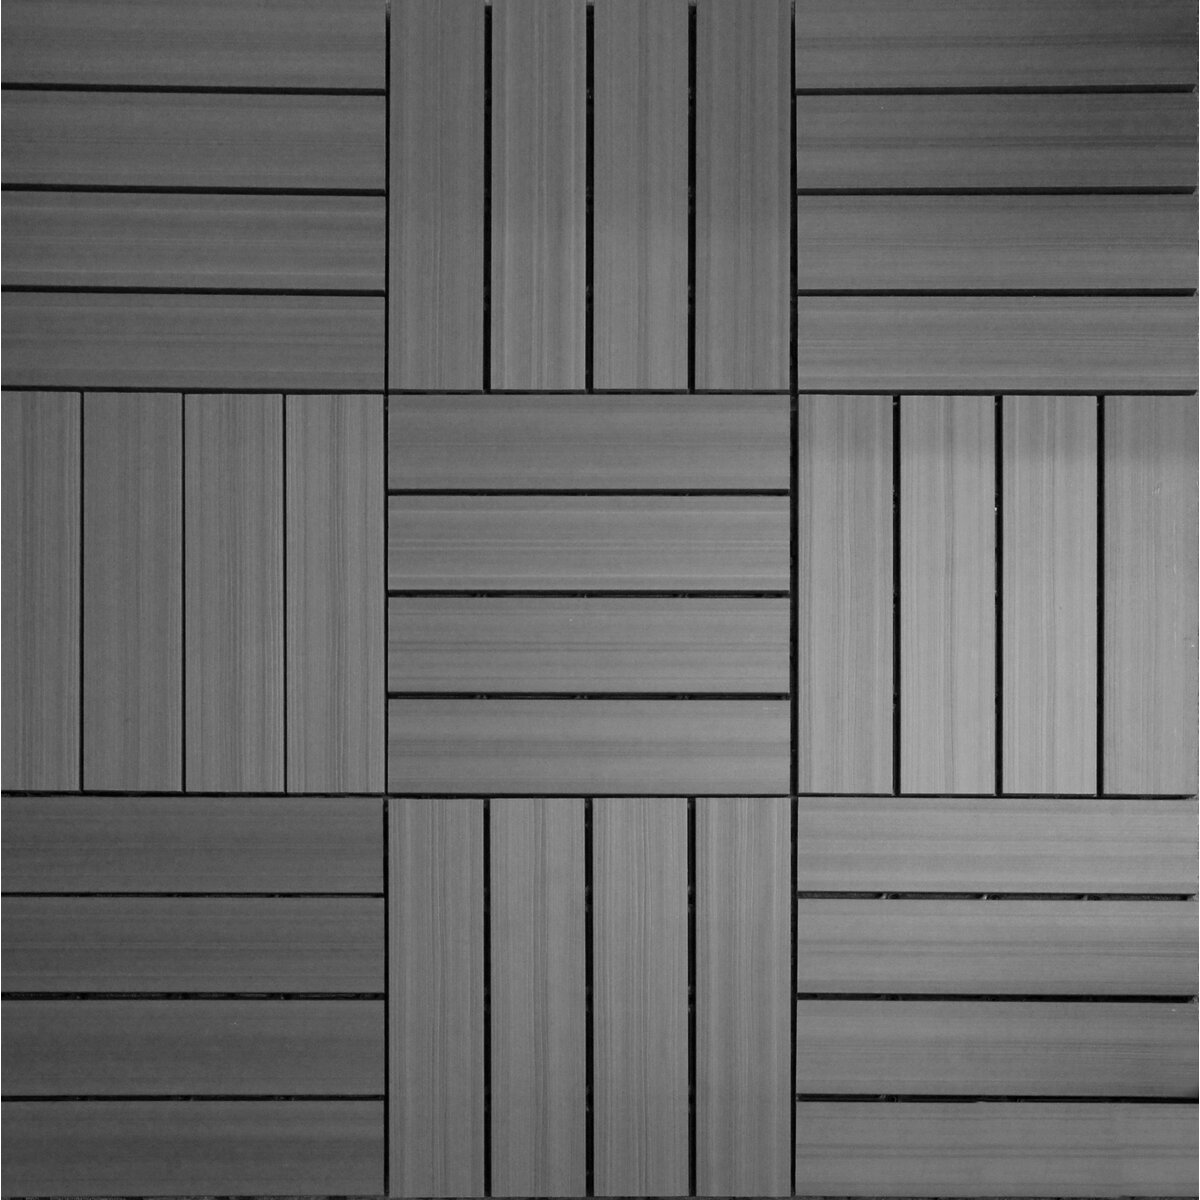 Newtechwood Ultrashield Westminster Wood 12 Quot X 12 Quot Outdoor